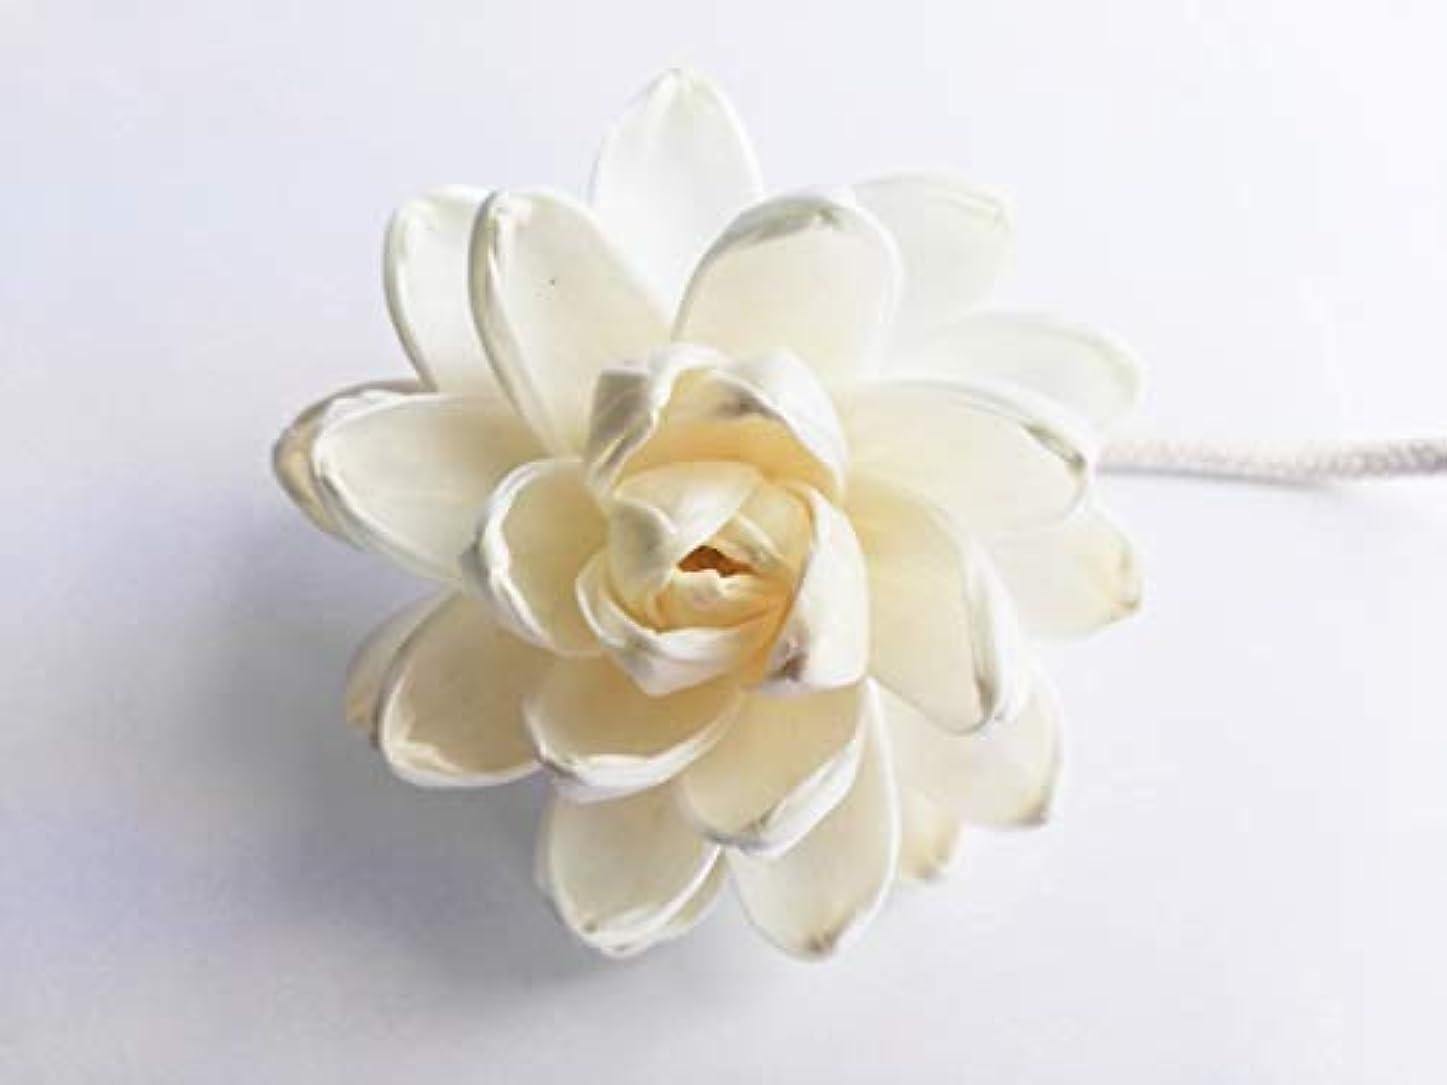 MAYA フラワーディフューザー ソラフラワー ロータス (8cm) [並行輸入品]   Aroma Flower Diffuser Sola Flower - Lotus